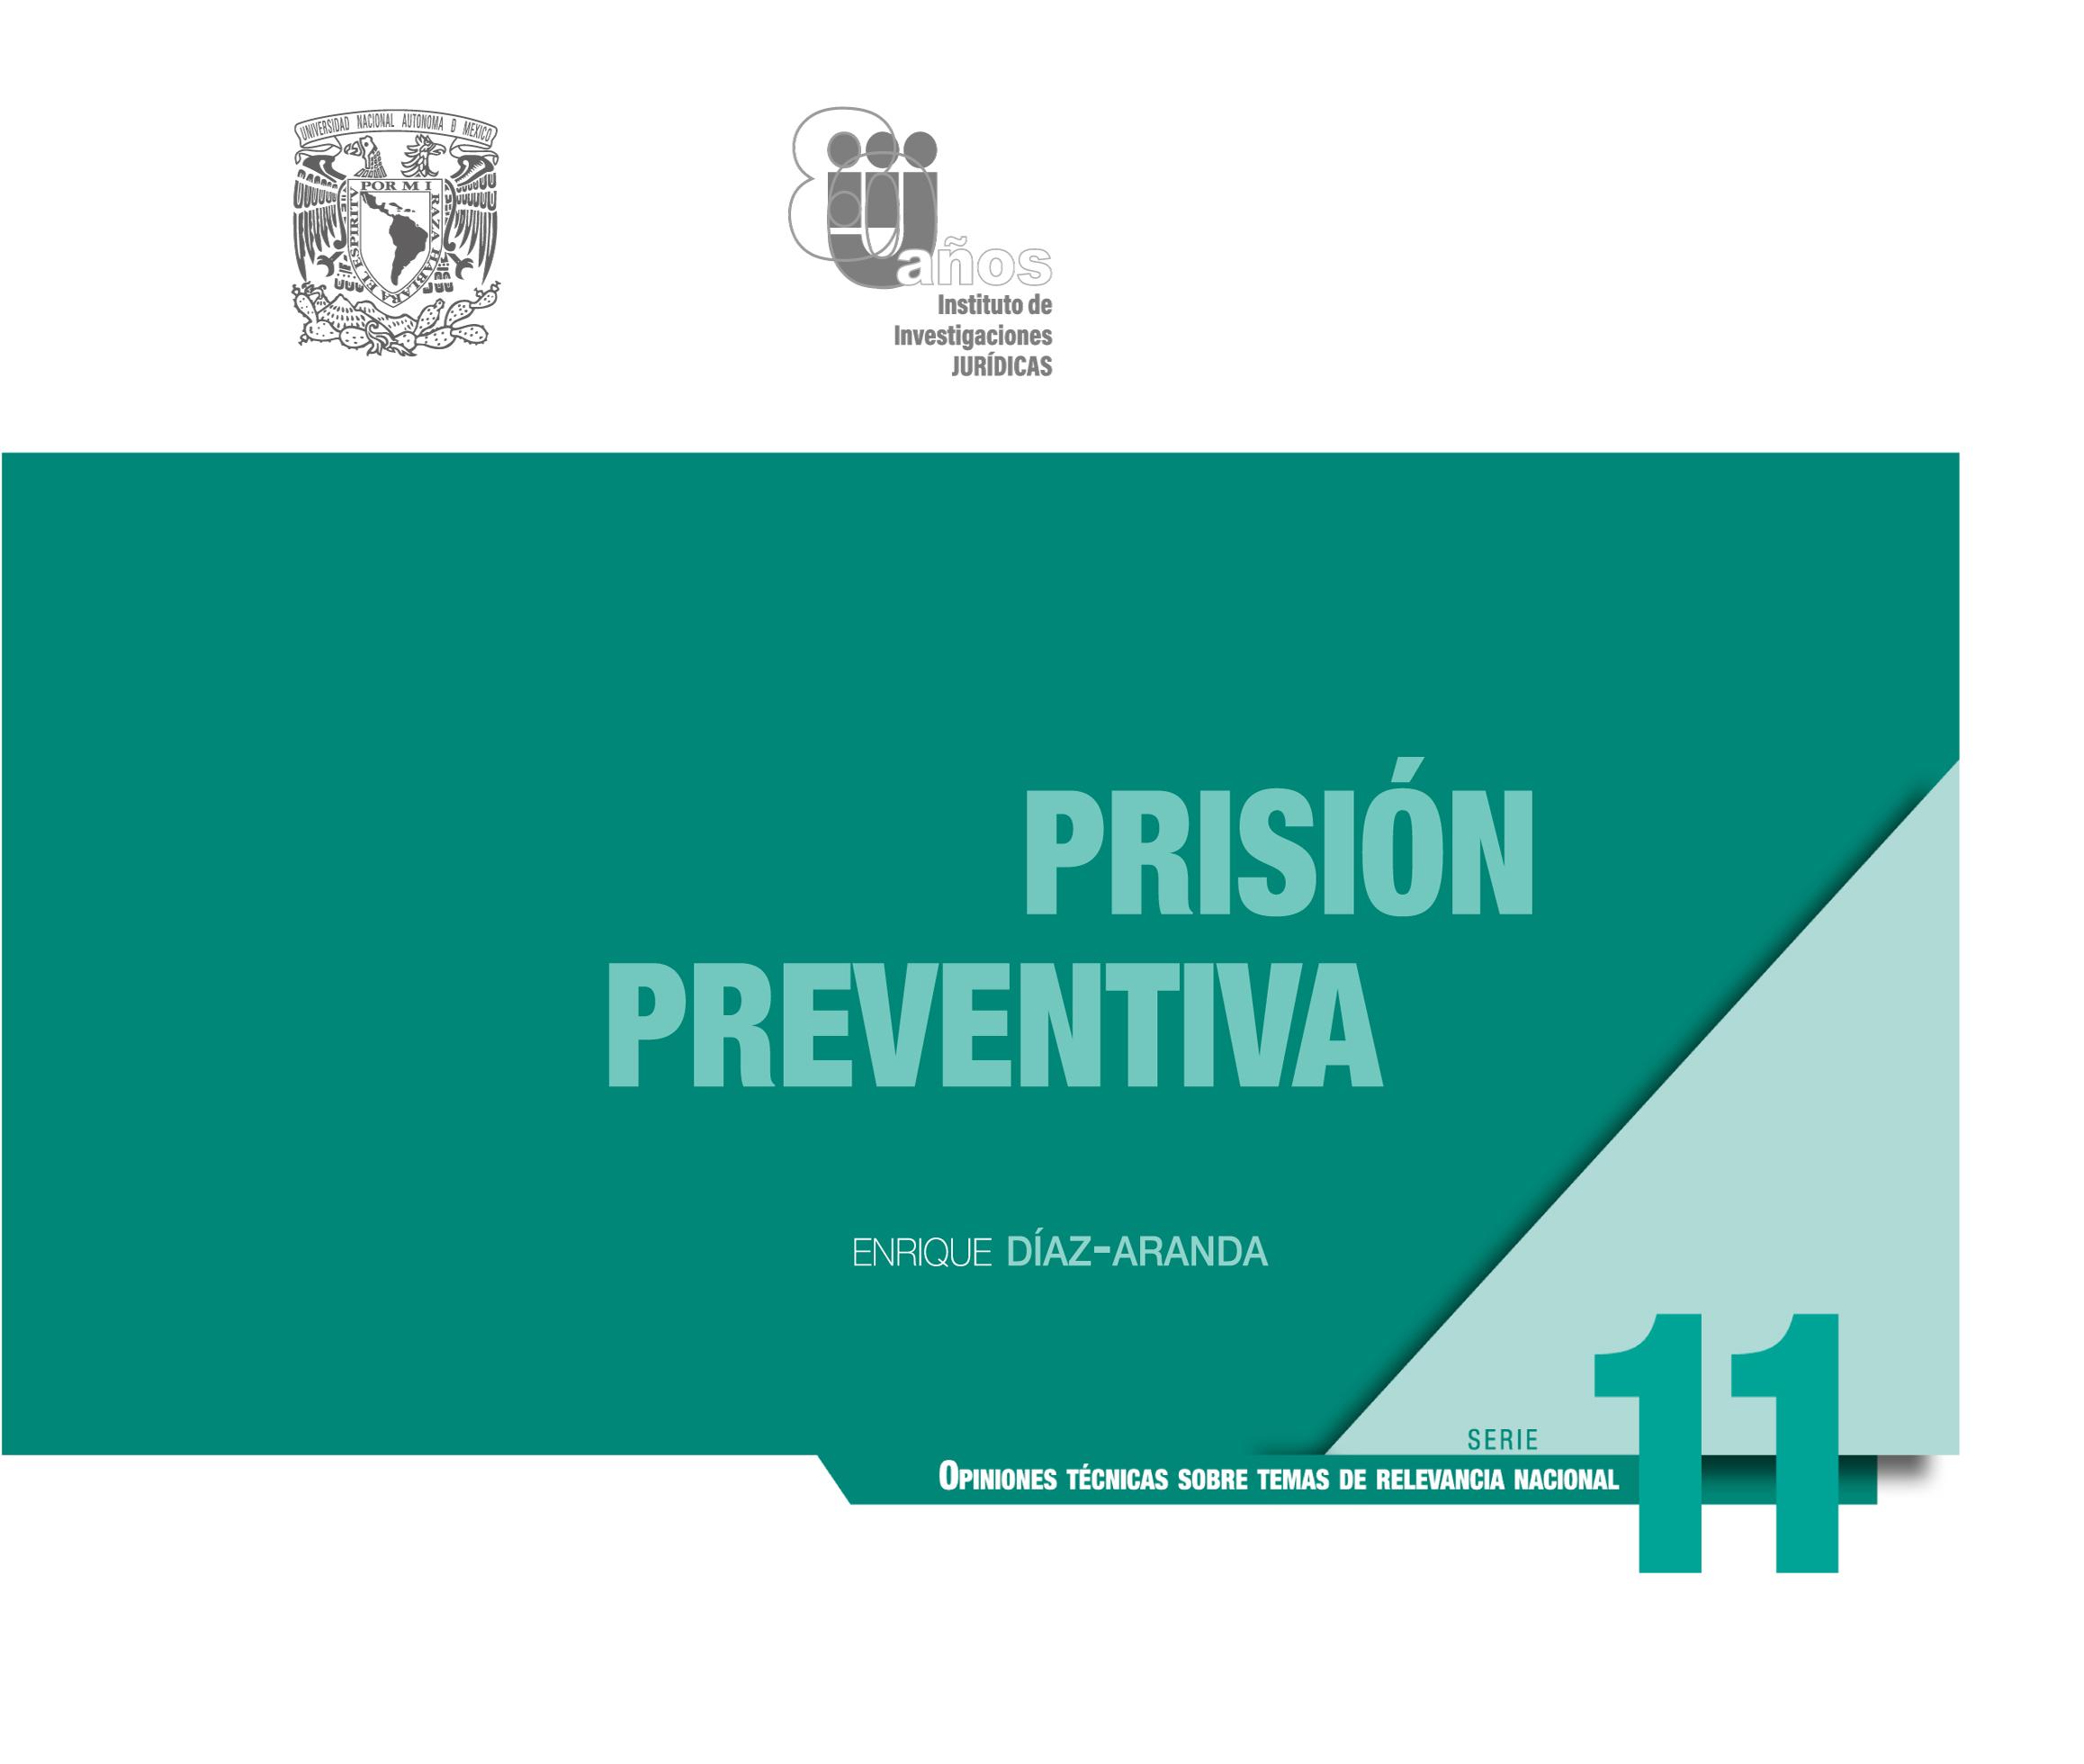 Prisión preventiva. Serie Opiniones Técnicas sobre Temas de Relevancia Nacional, núm. 11